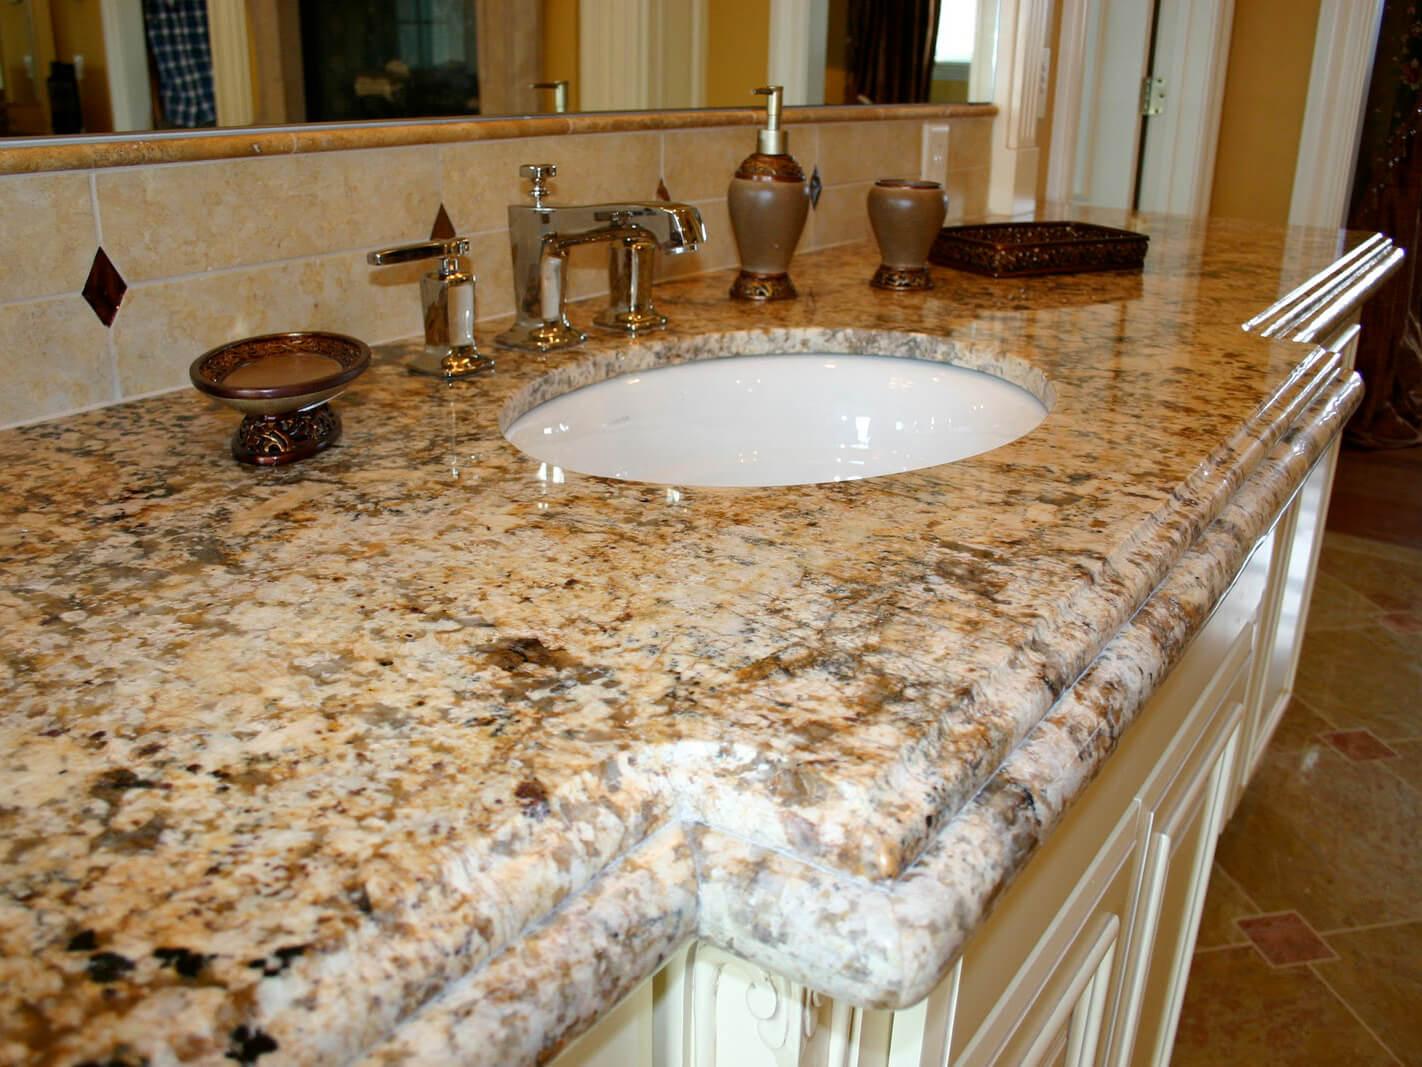 bàn lavabo Đá Granite Golden Forest Brazil